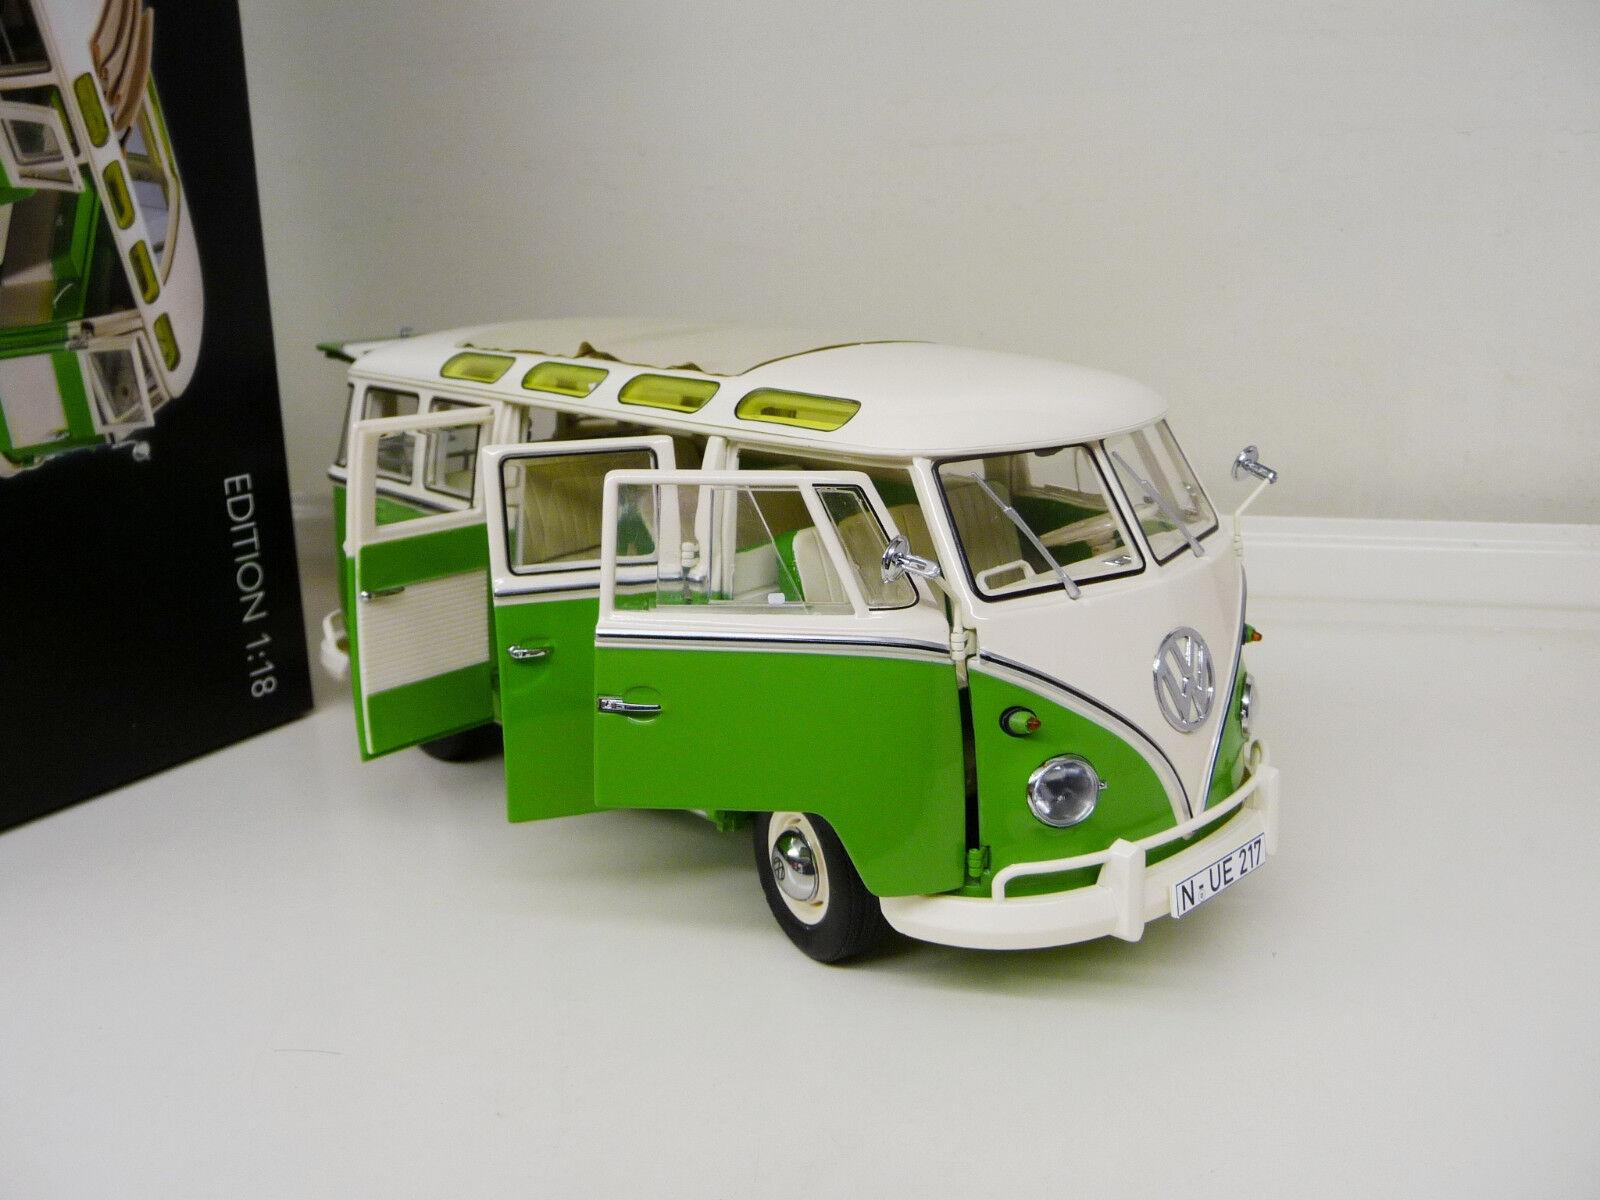 Vw volkswagen t1 samba - bus 18 schuco lightGrün new free shipping worldwide